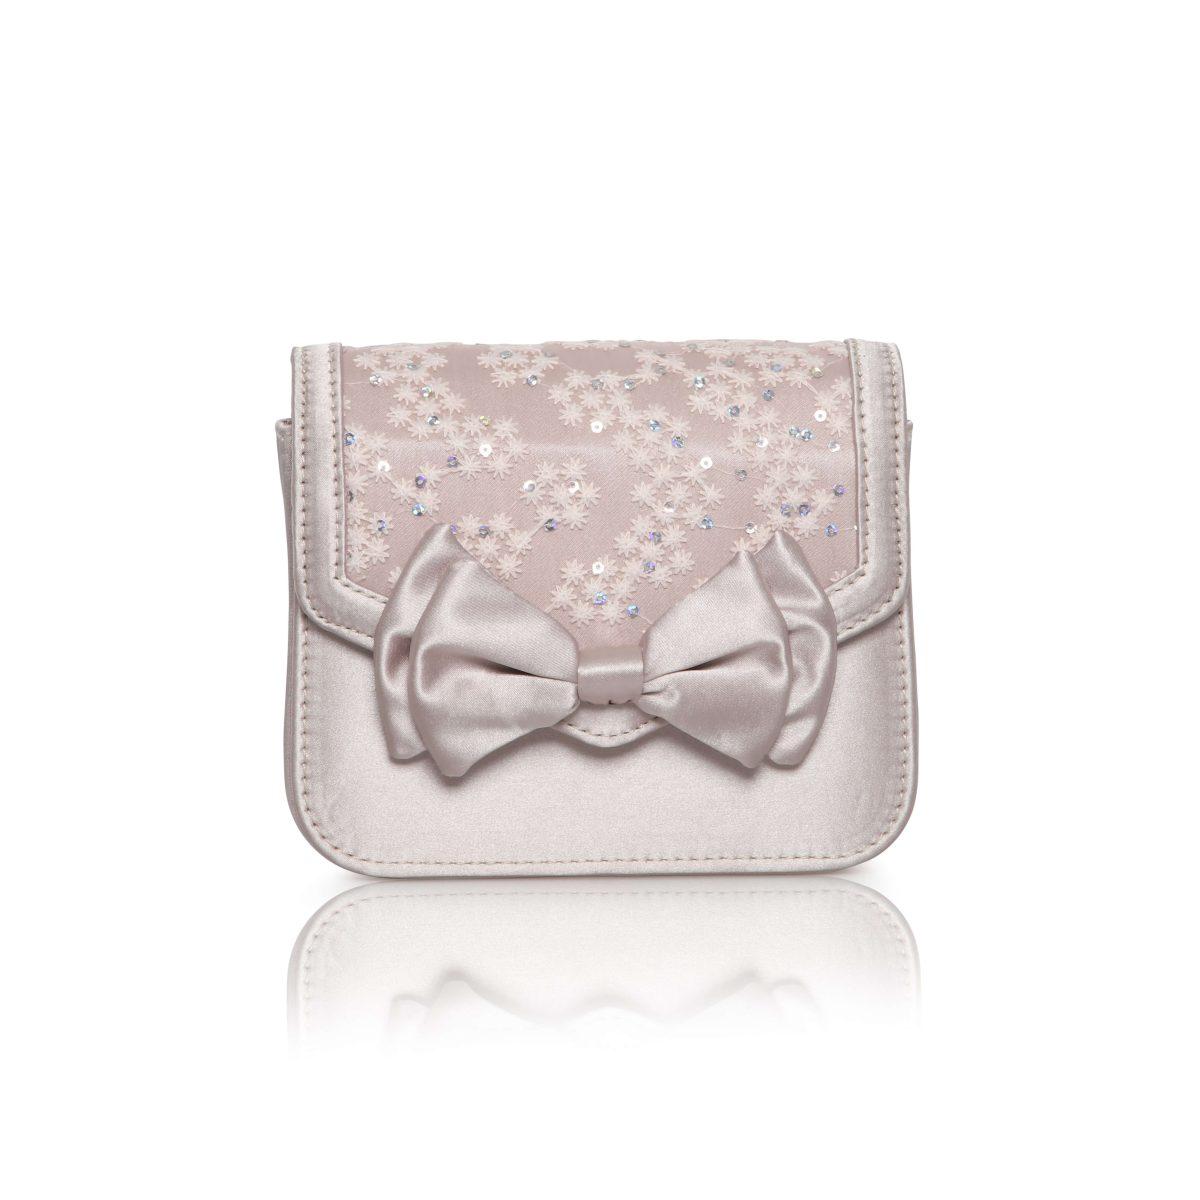 Perfect Bridal Pepper Bridal Bag - Taupe Satin/Lace 1